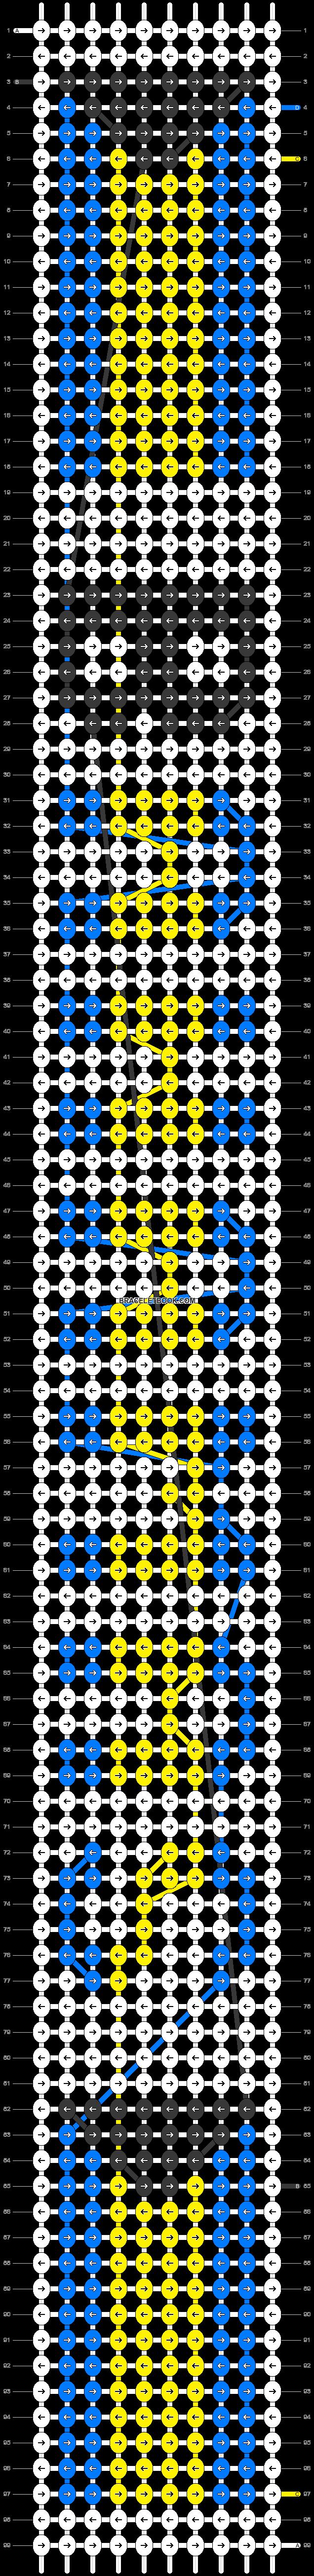 Alpha pattern #31139 pattern